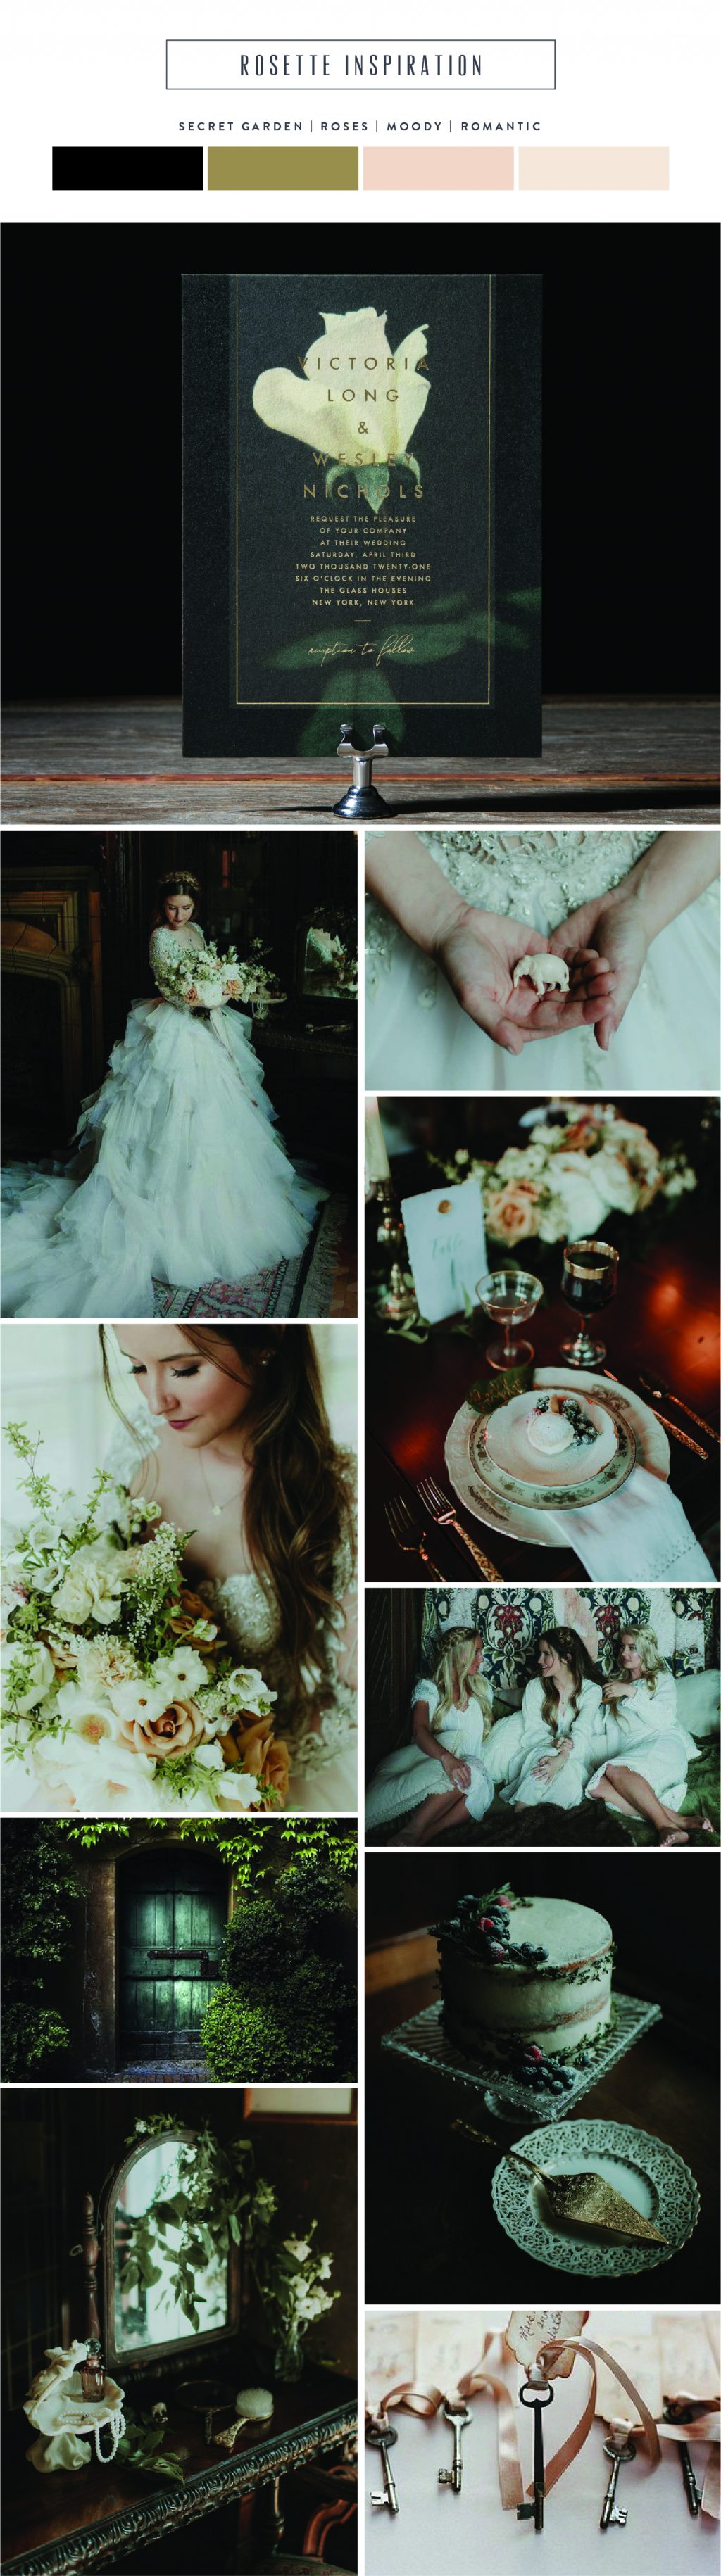 Introducing Rosette: secret garden inspired wedding invitations by Bella Figura